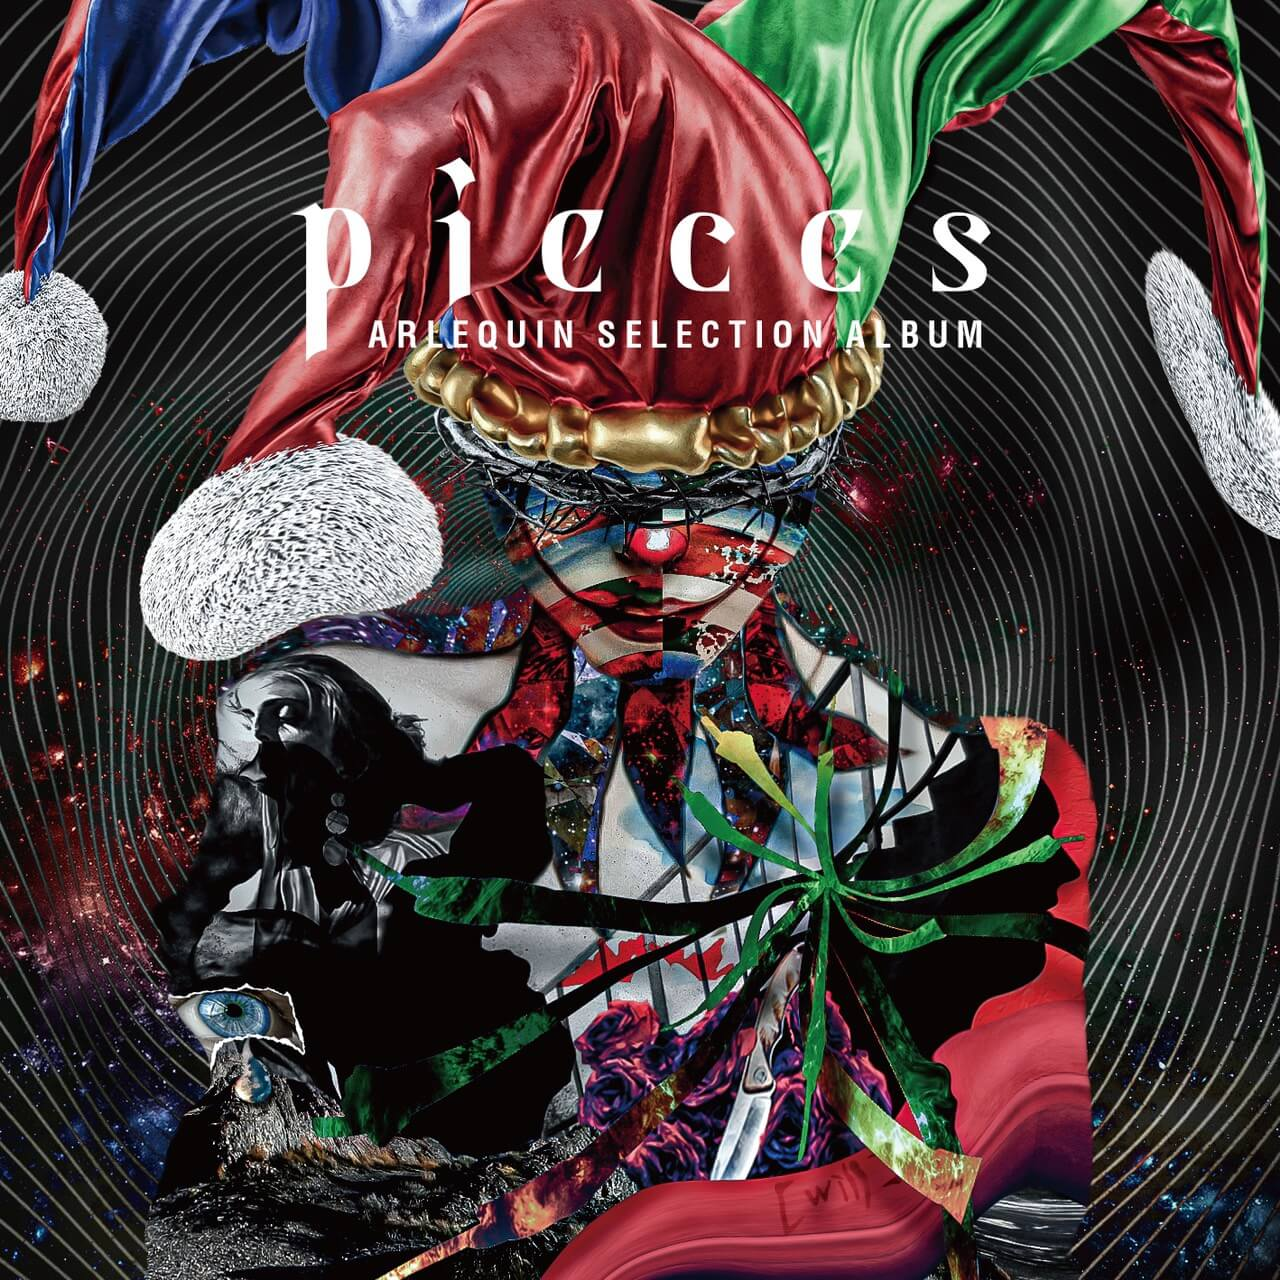 ARLEQUIN SELECTION ALBUM「pieces」